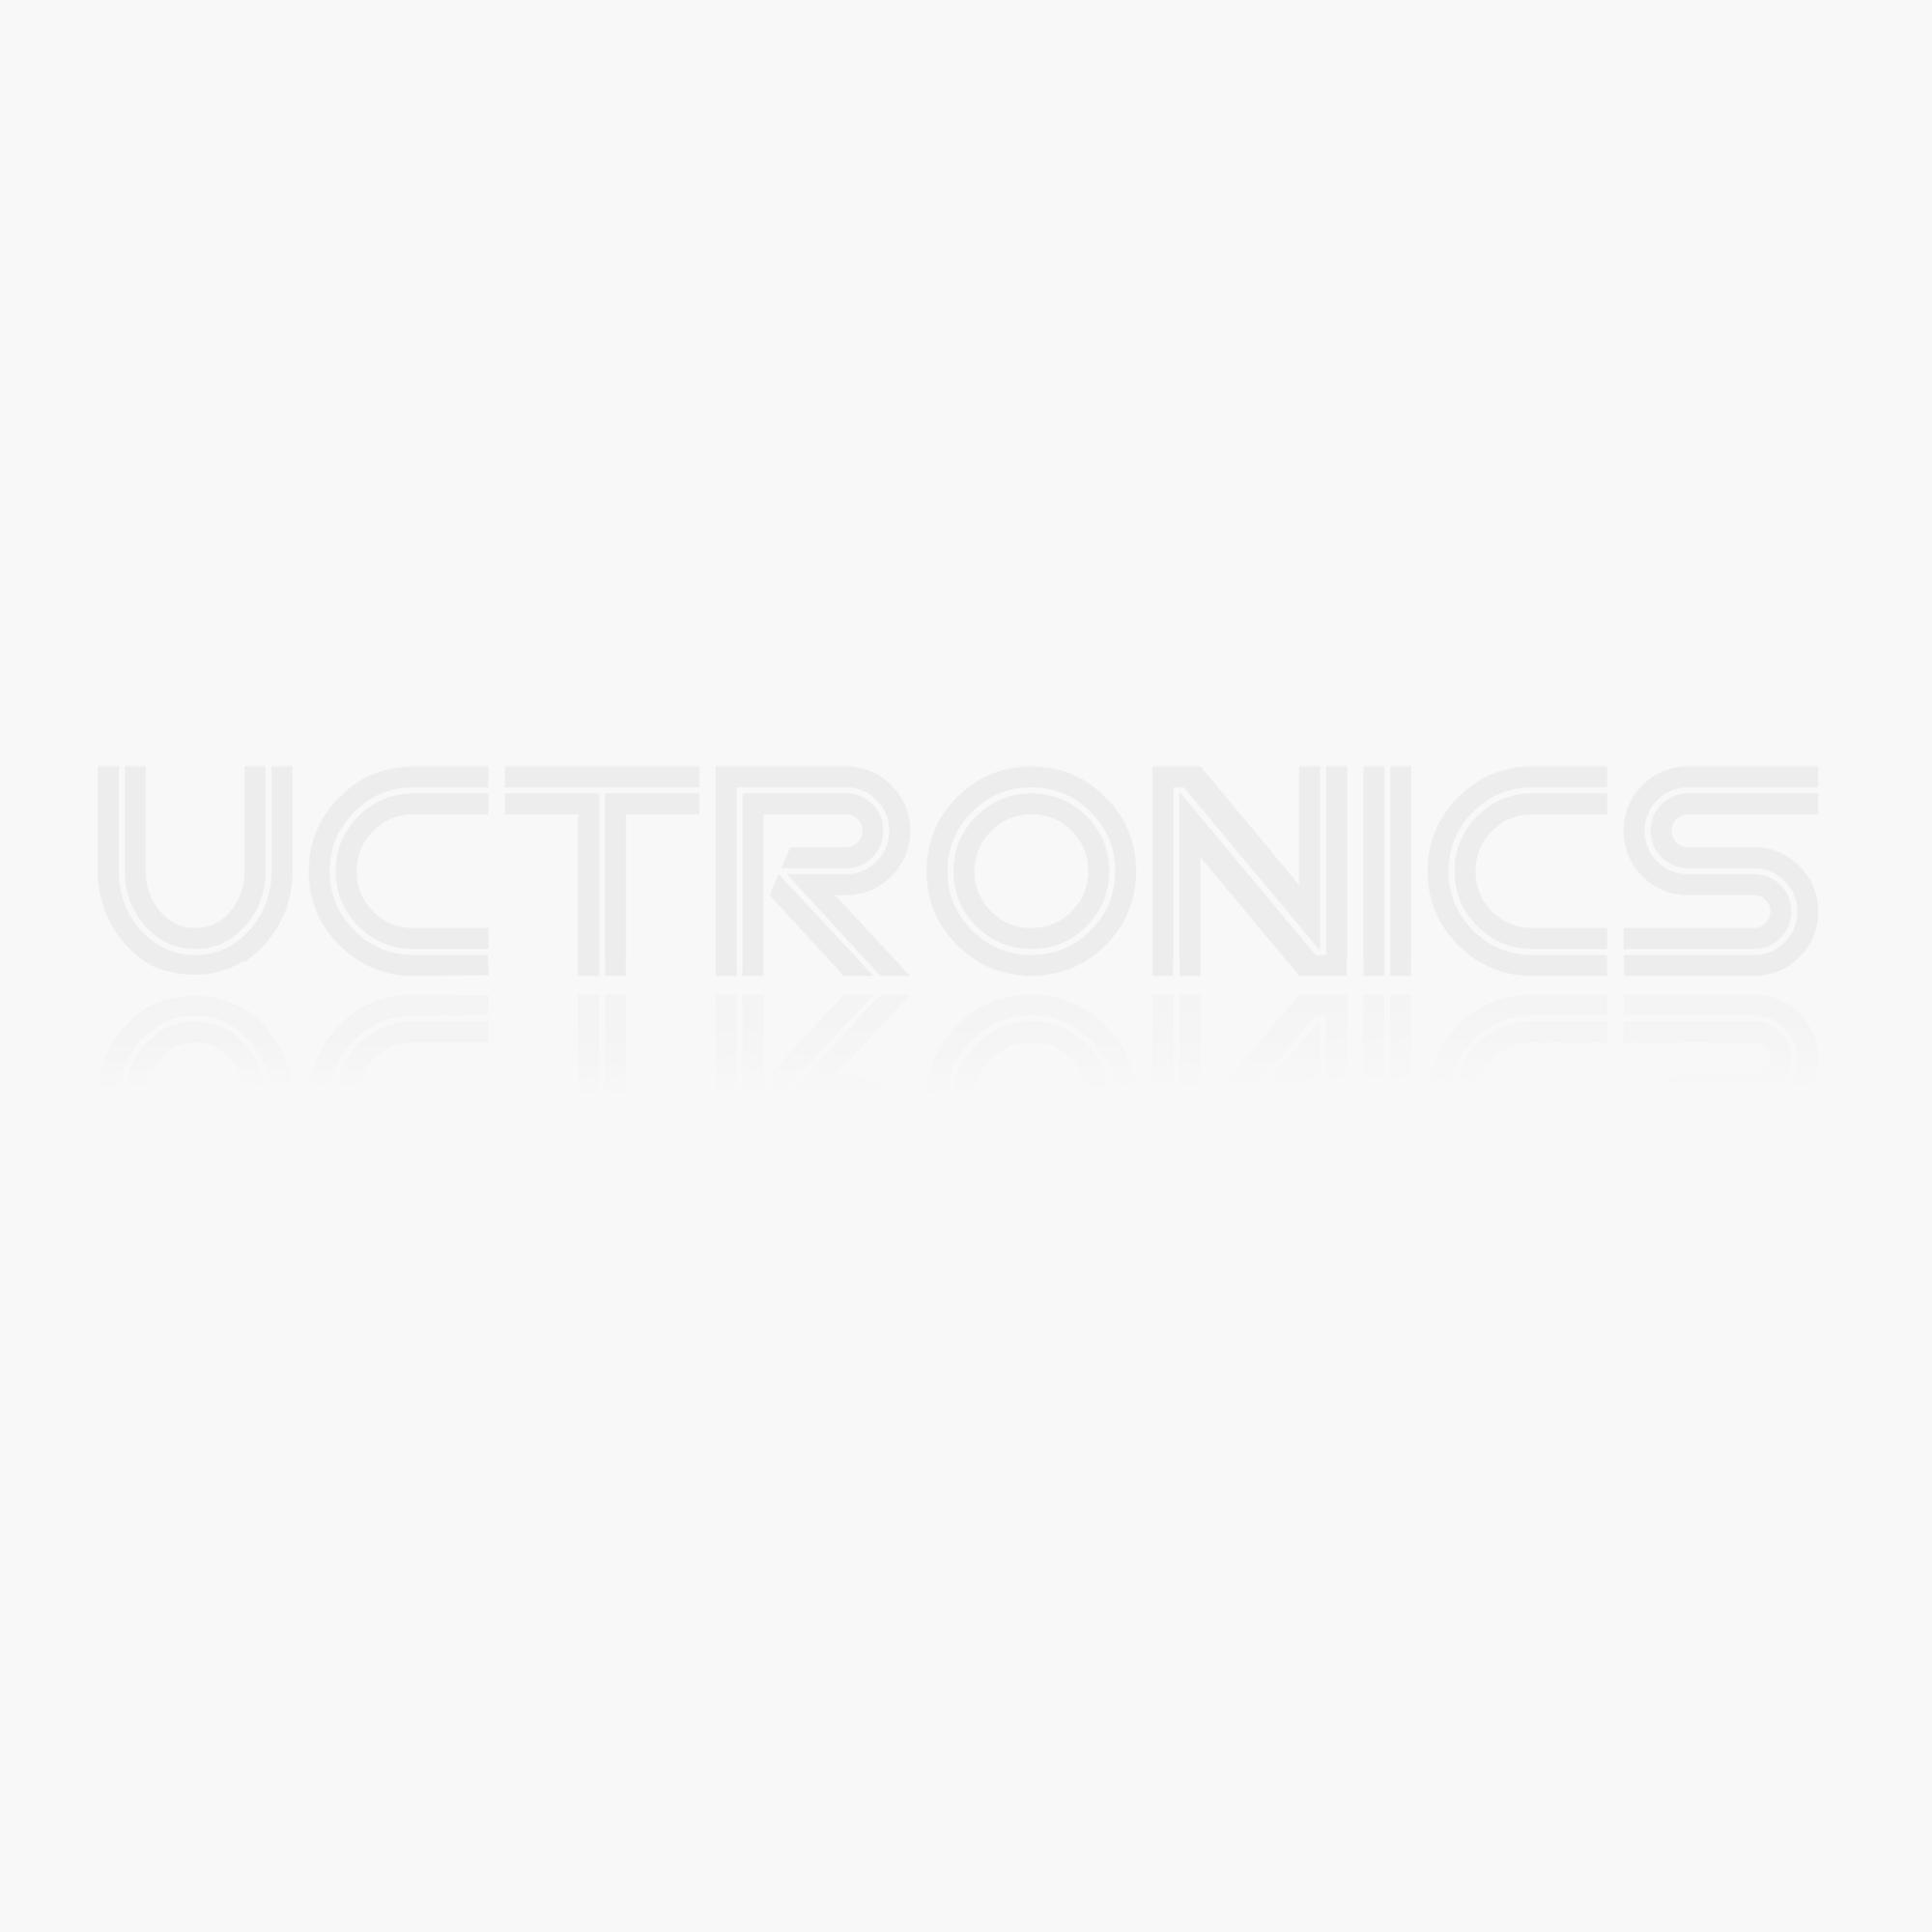 11Values 110pcs SOT23 SMD SMT 3pin TL431 S9013 Transistors Kits